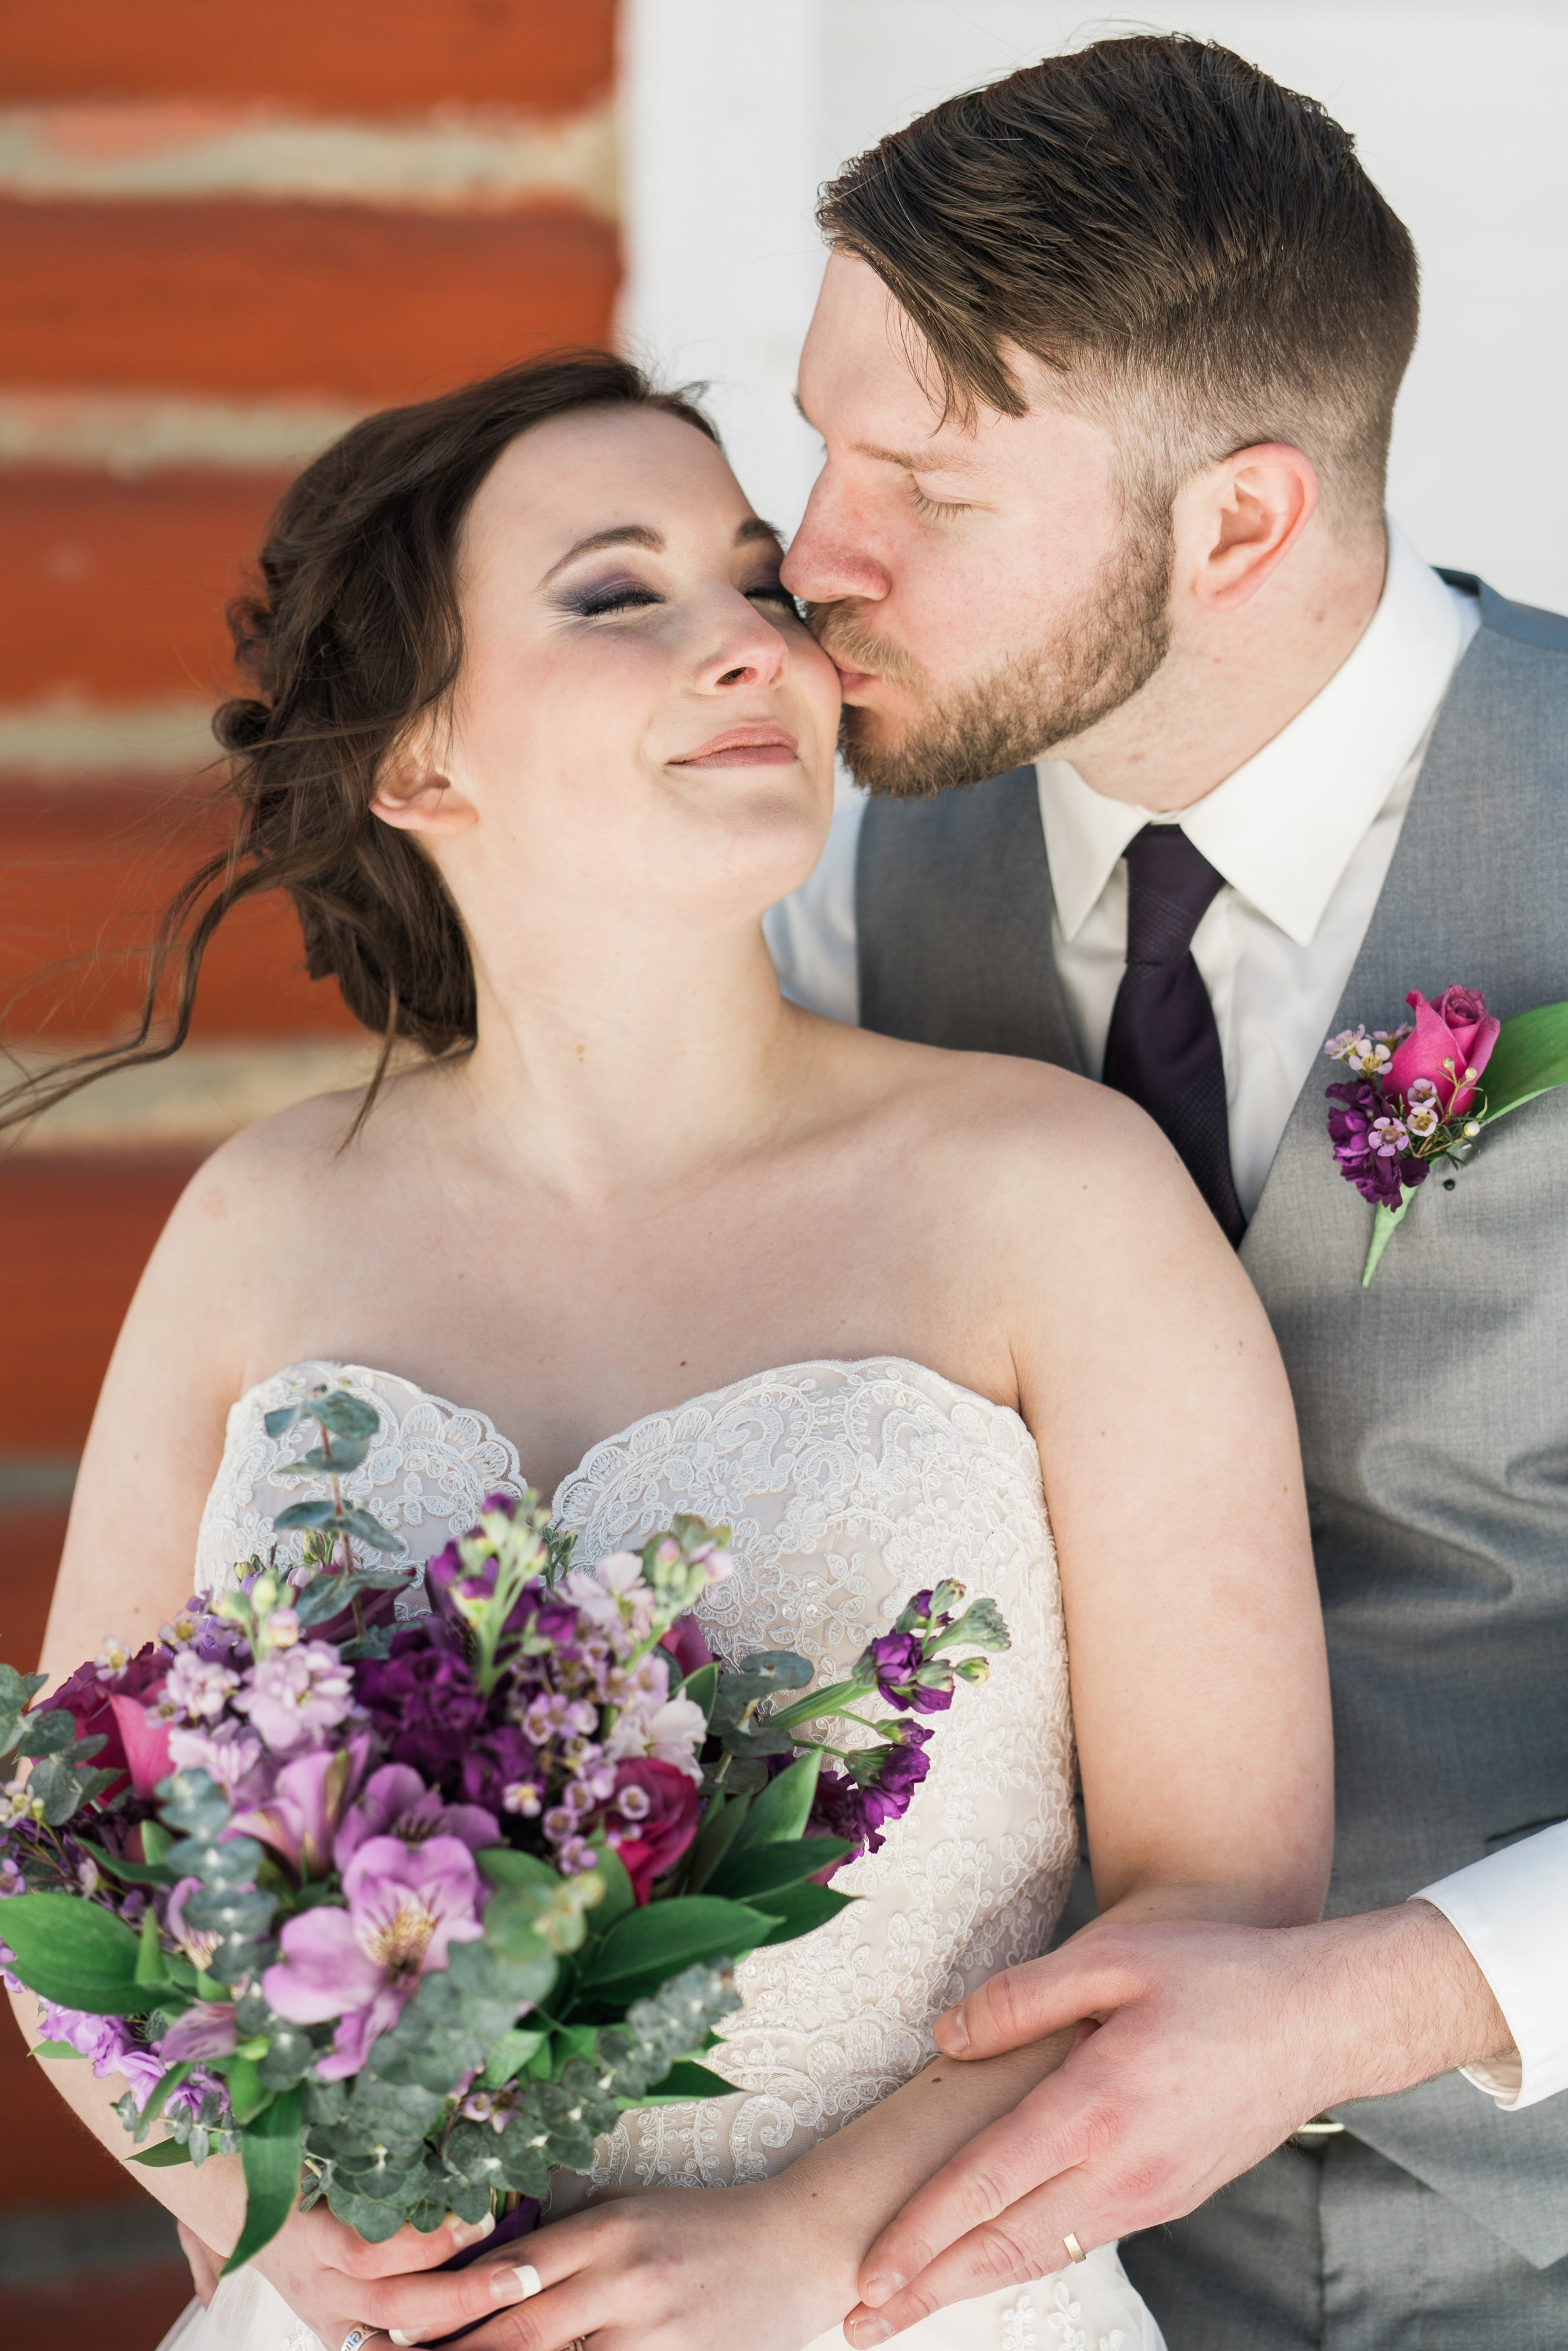 snowy-intimate-wedding-25.jpg